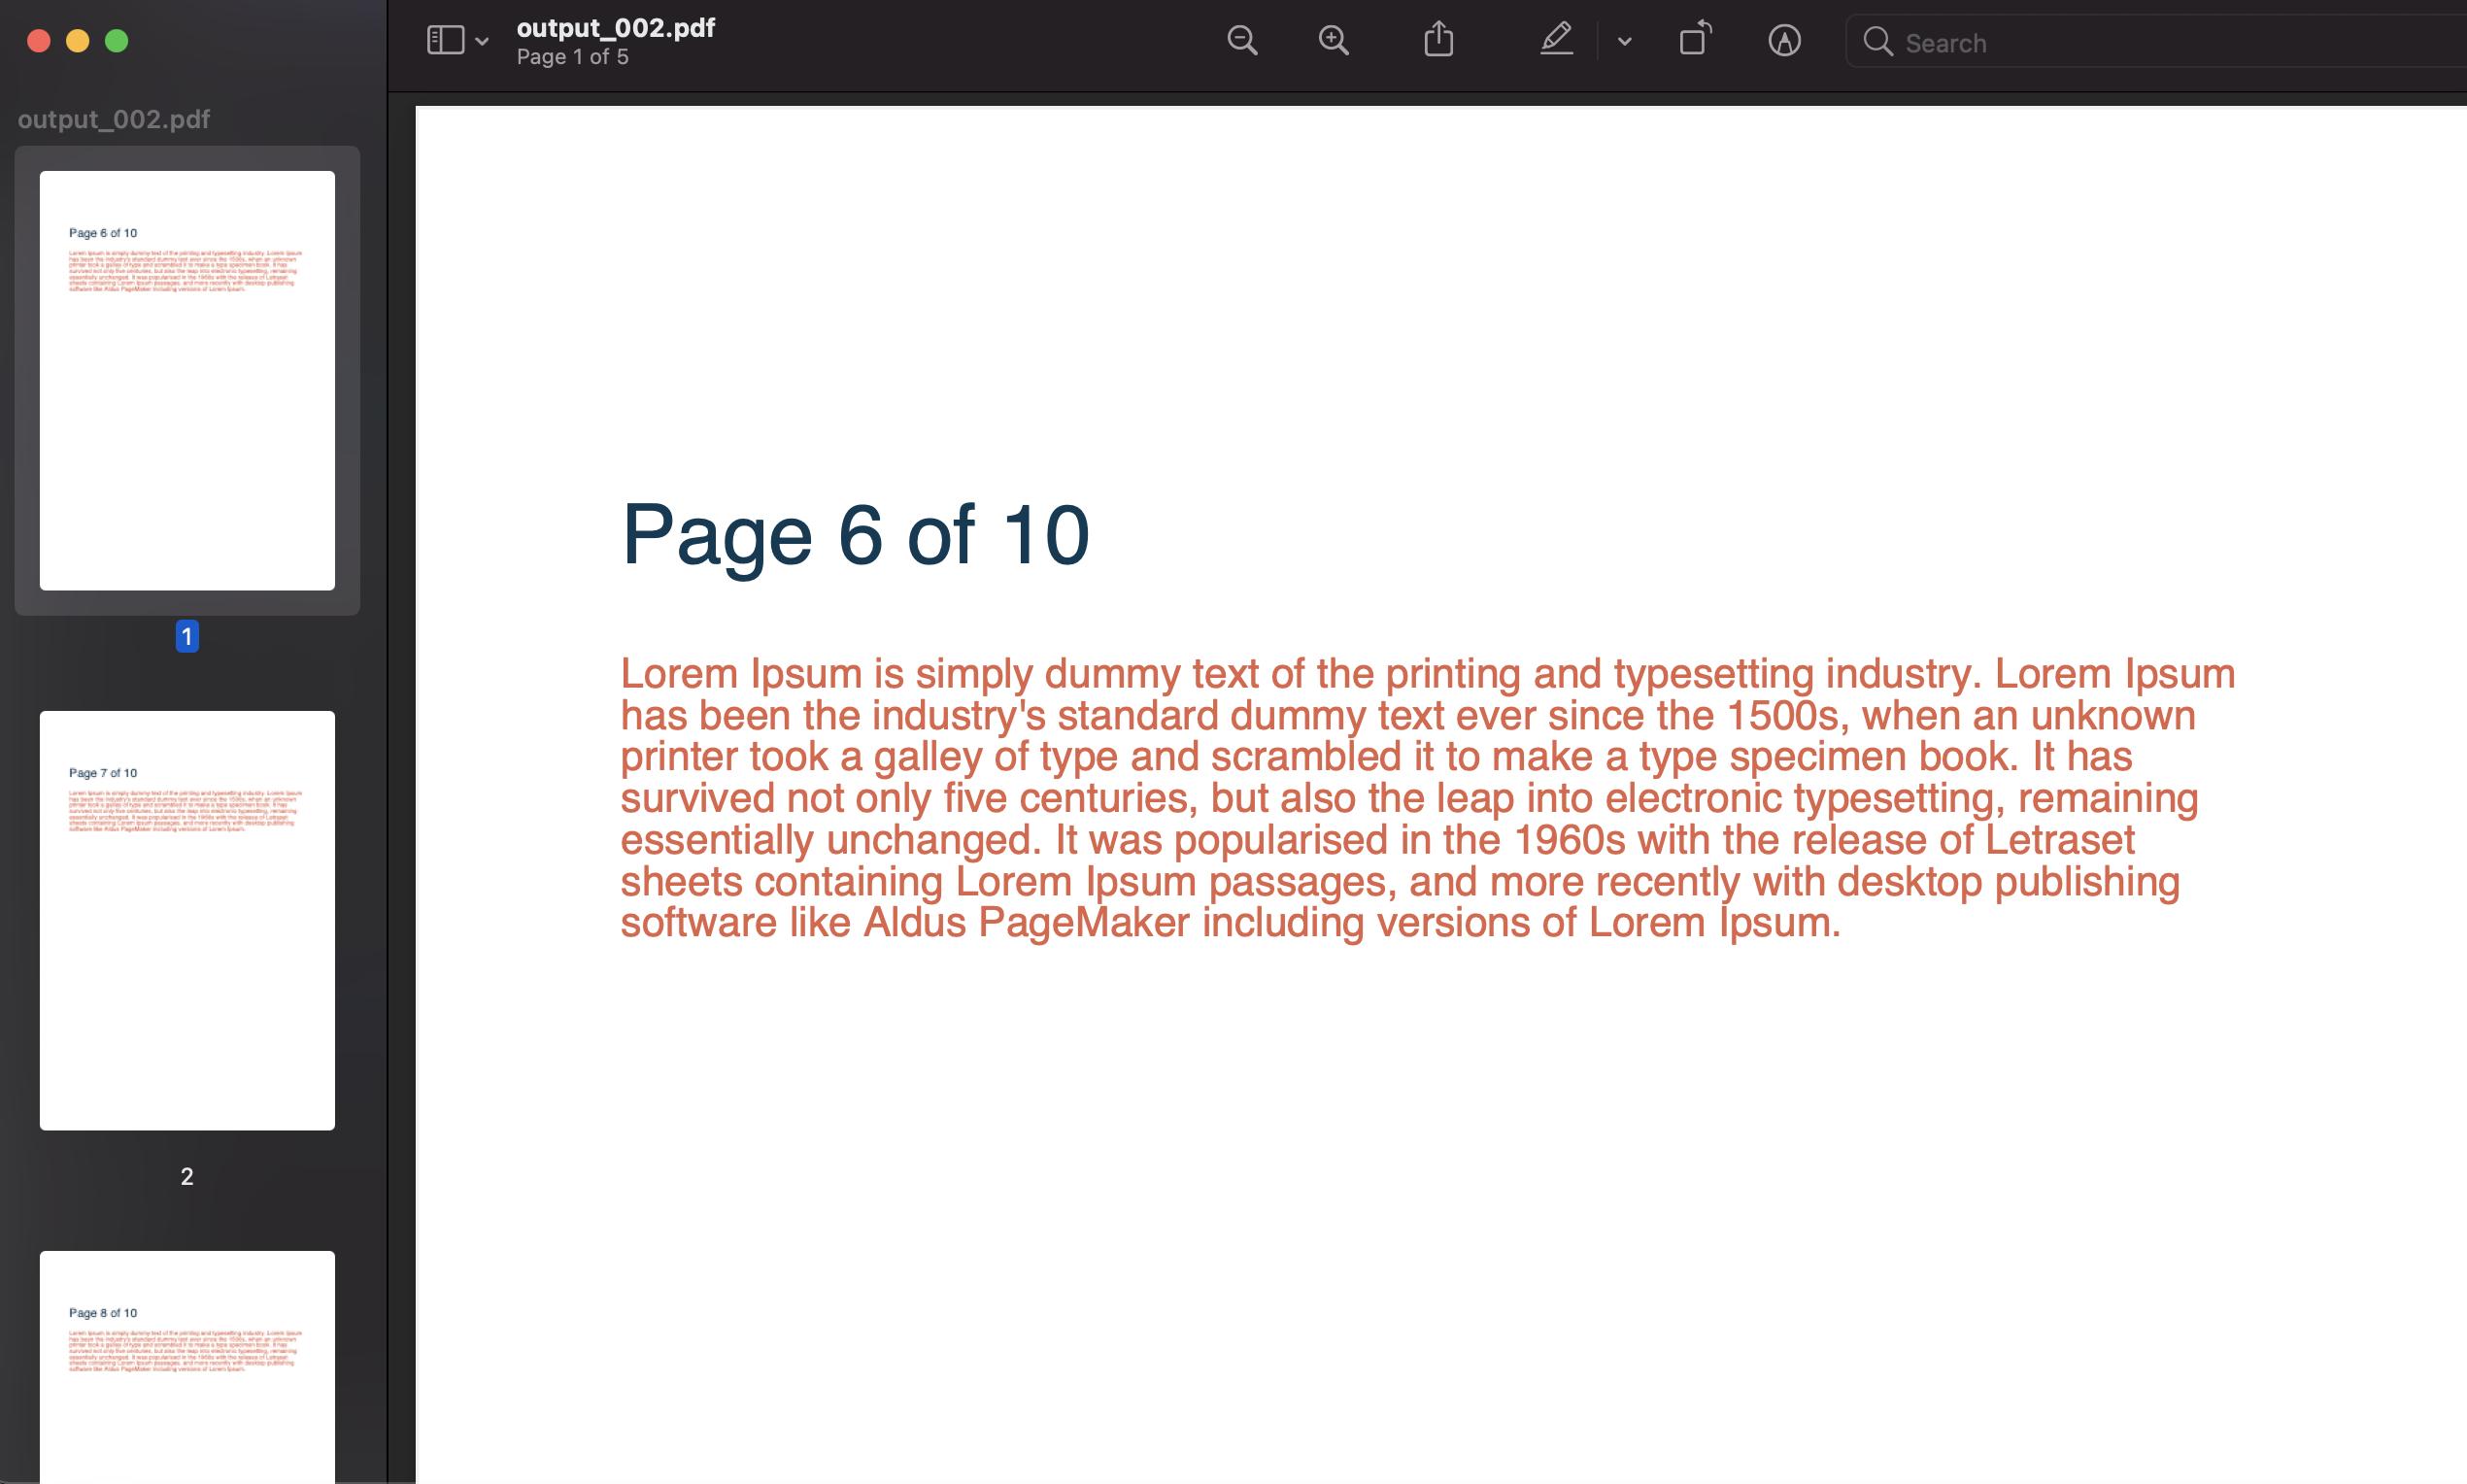 spllitting a pdf document in python